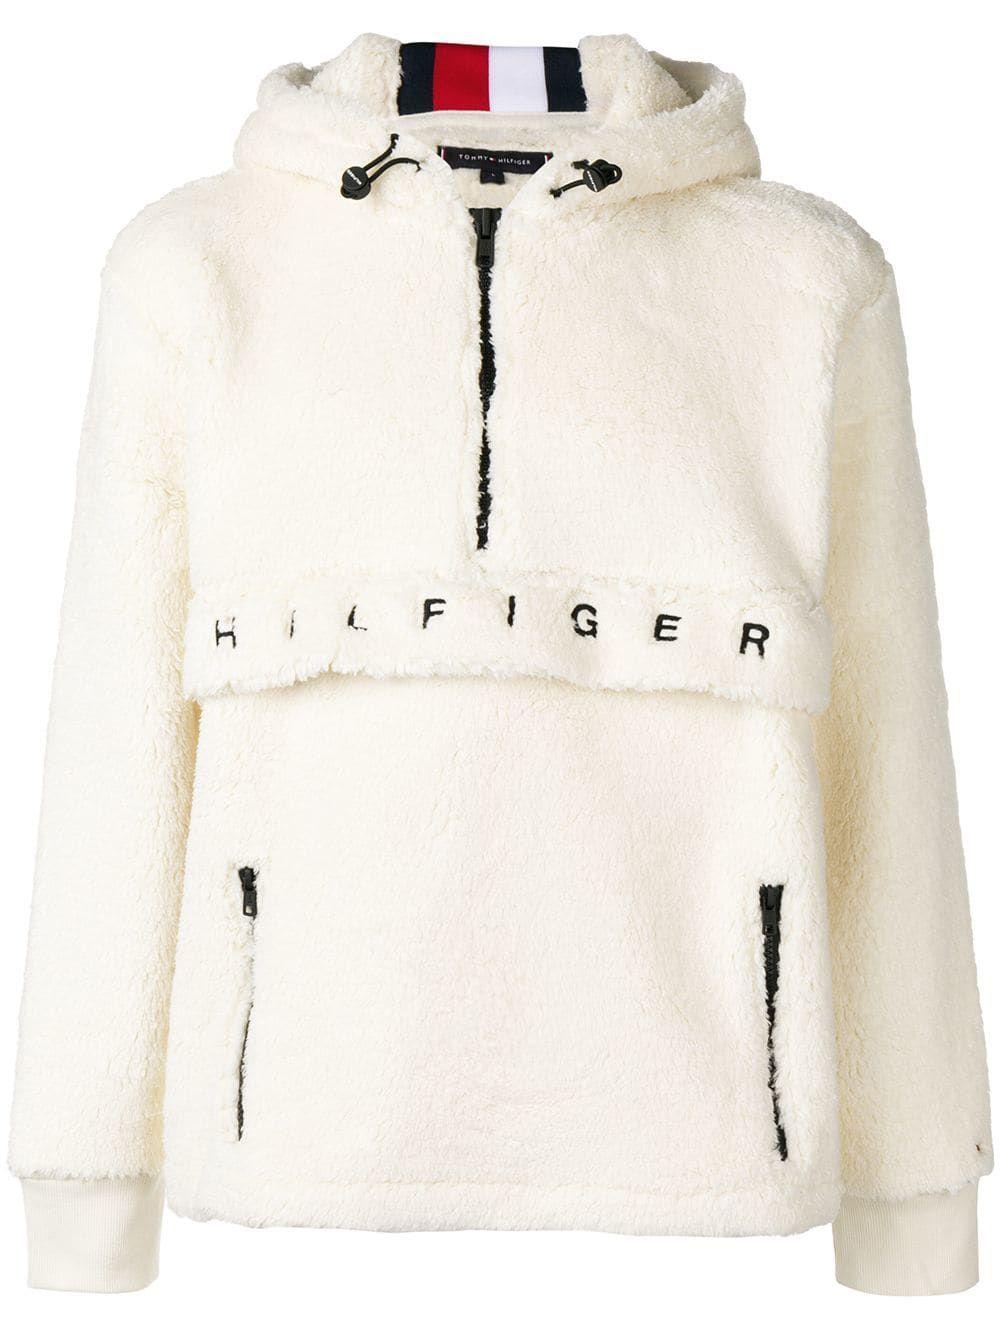 Tommy Hilfiger Fleece Hooded Sweatshirt White Modesens Tommy Hilfiger Sweatshirt Tommy Clothes Tommy Hilfiger Hoodie [ 1334 x 1000 Pixel ]